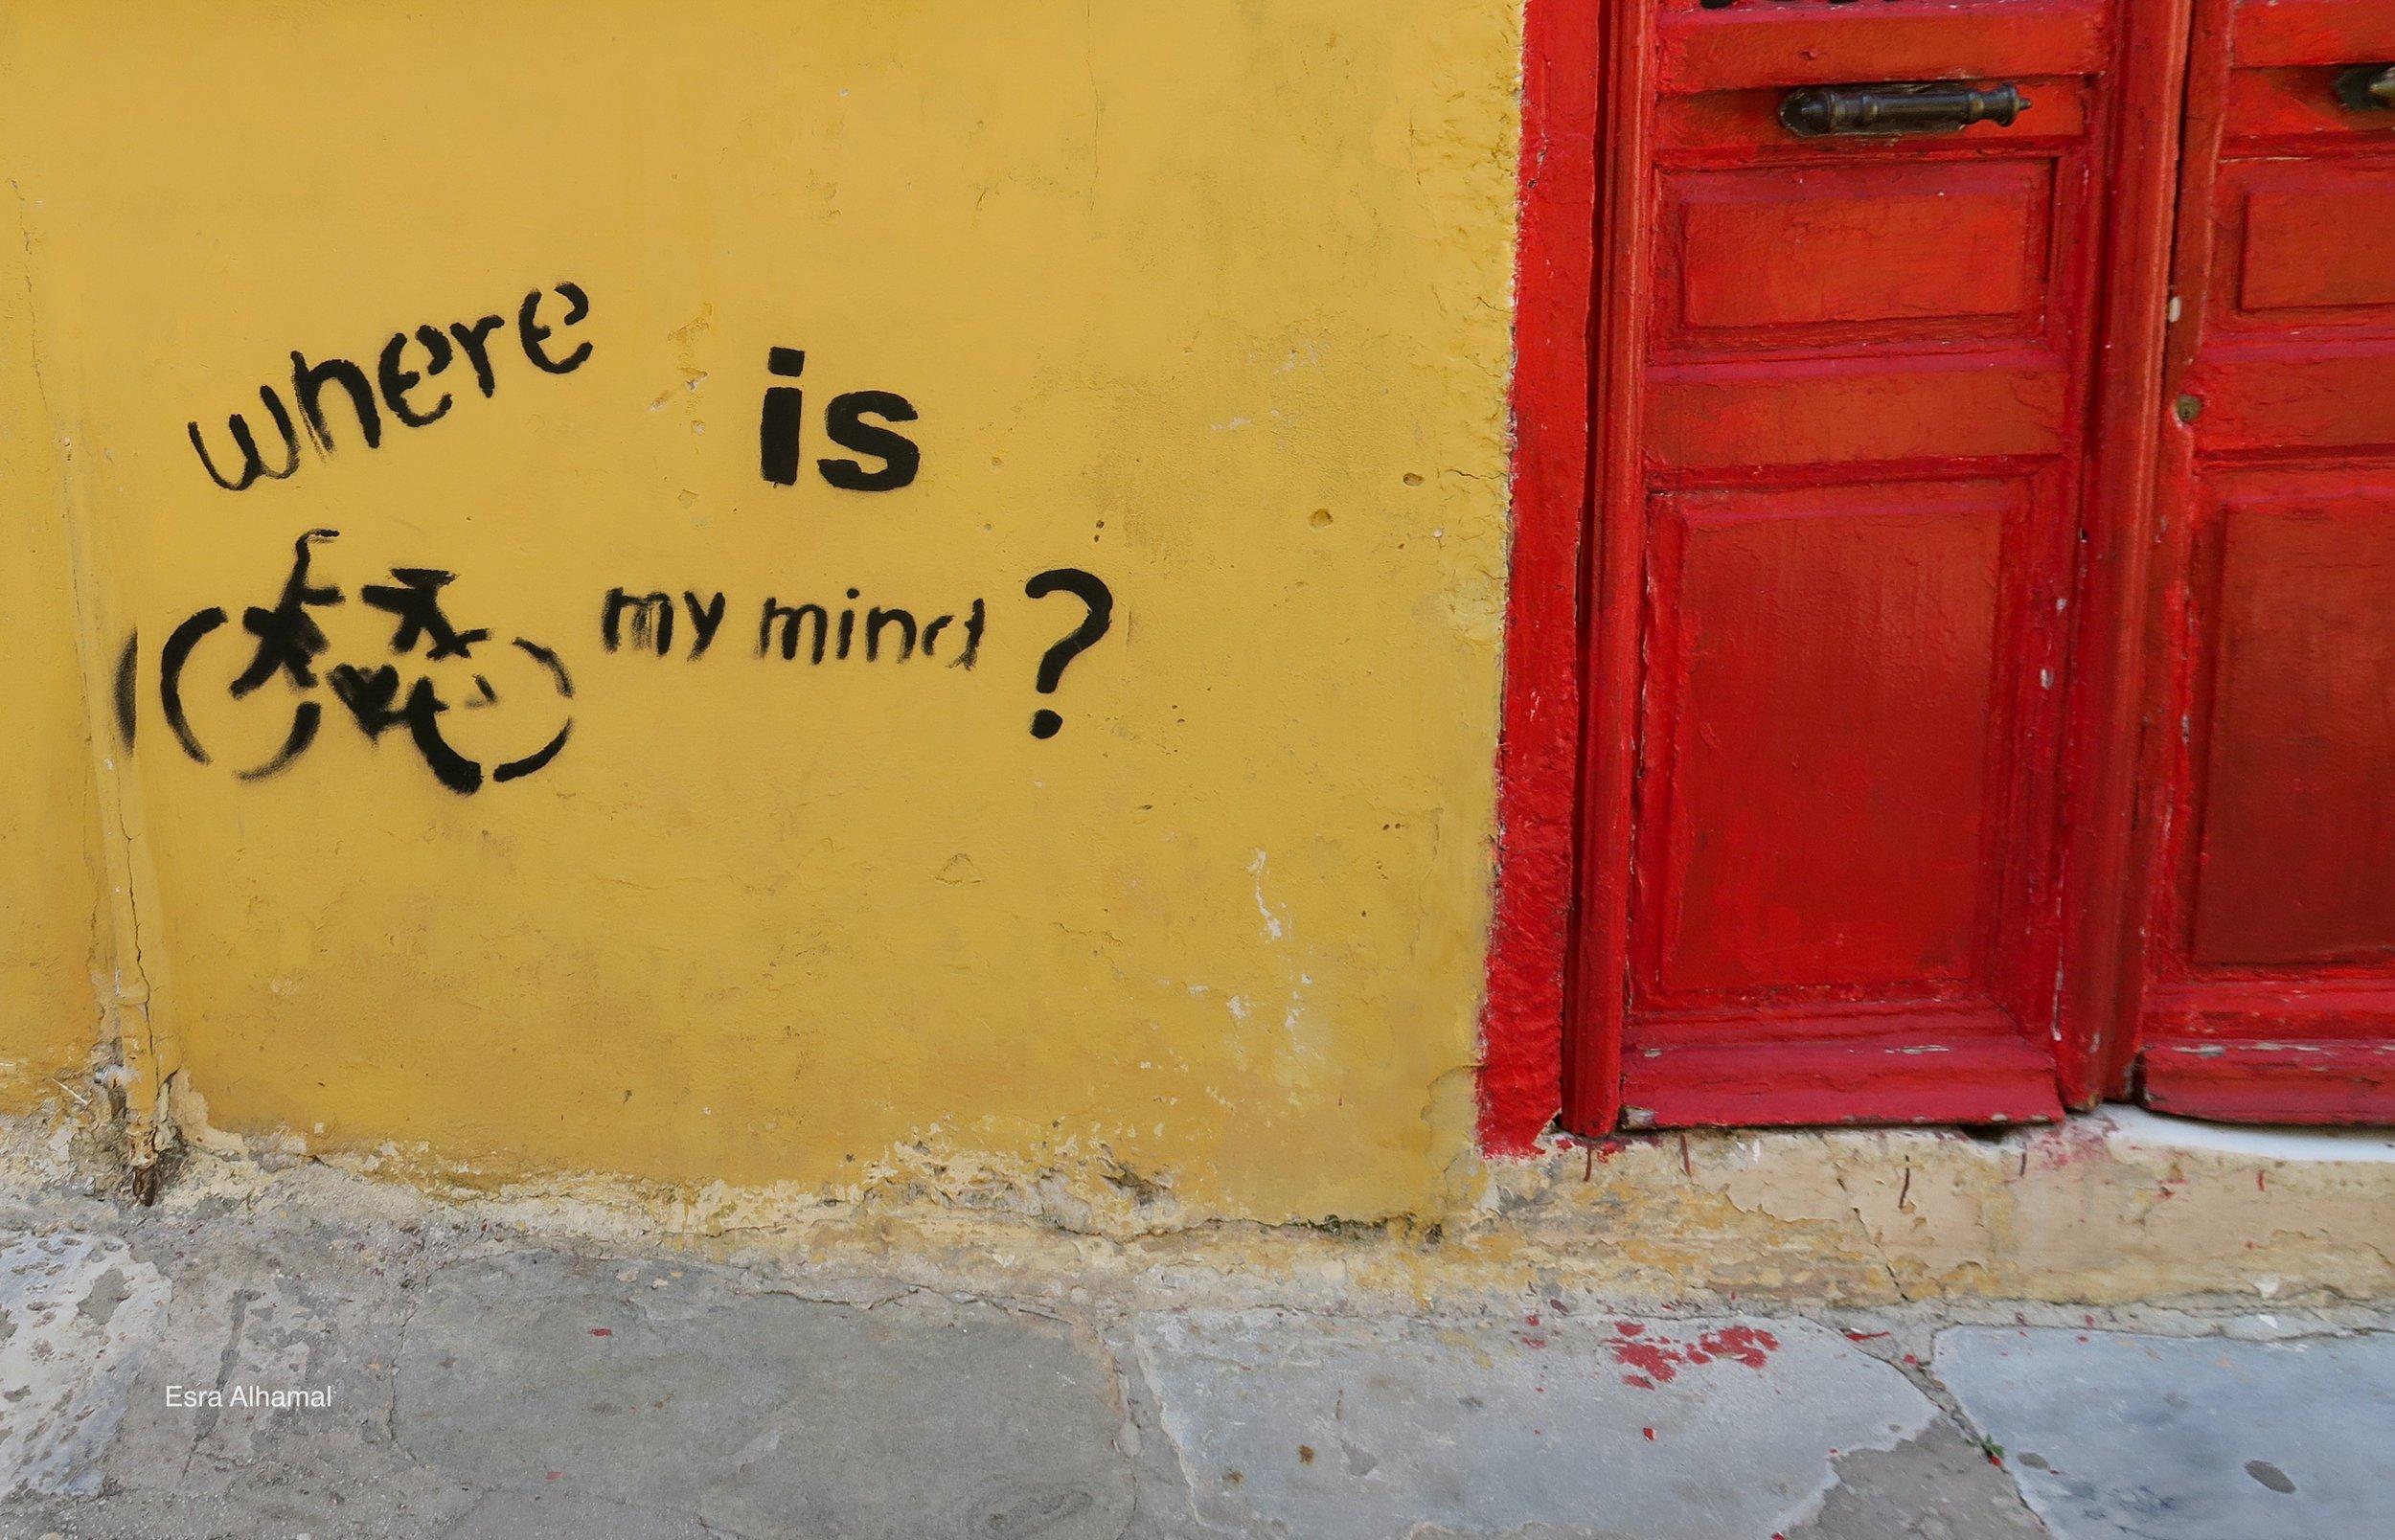 Where is my mind? Graffiti